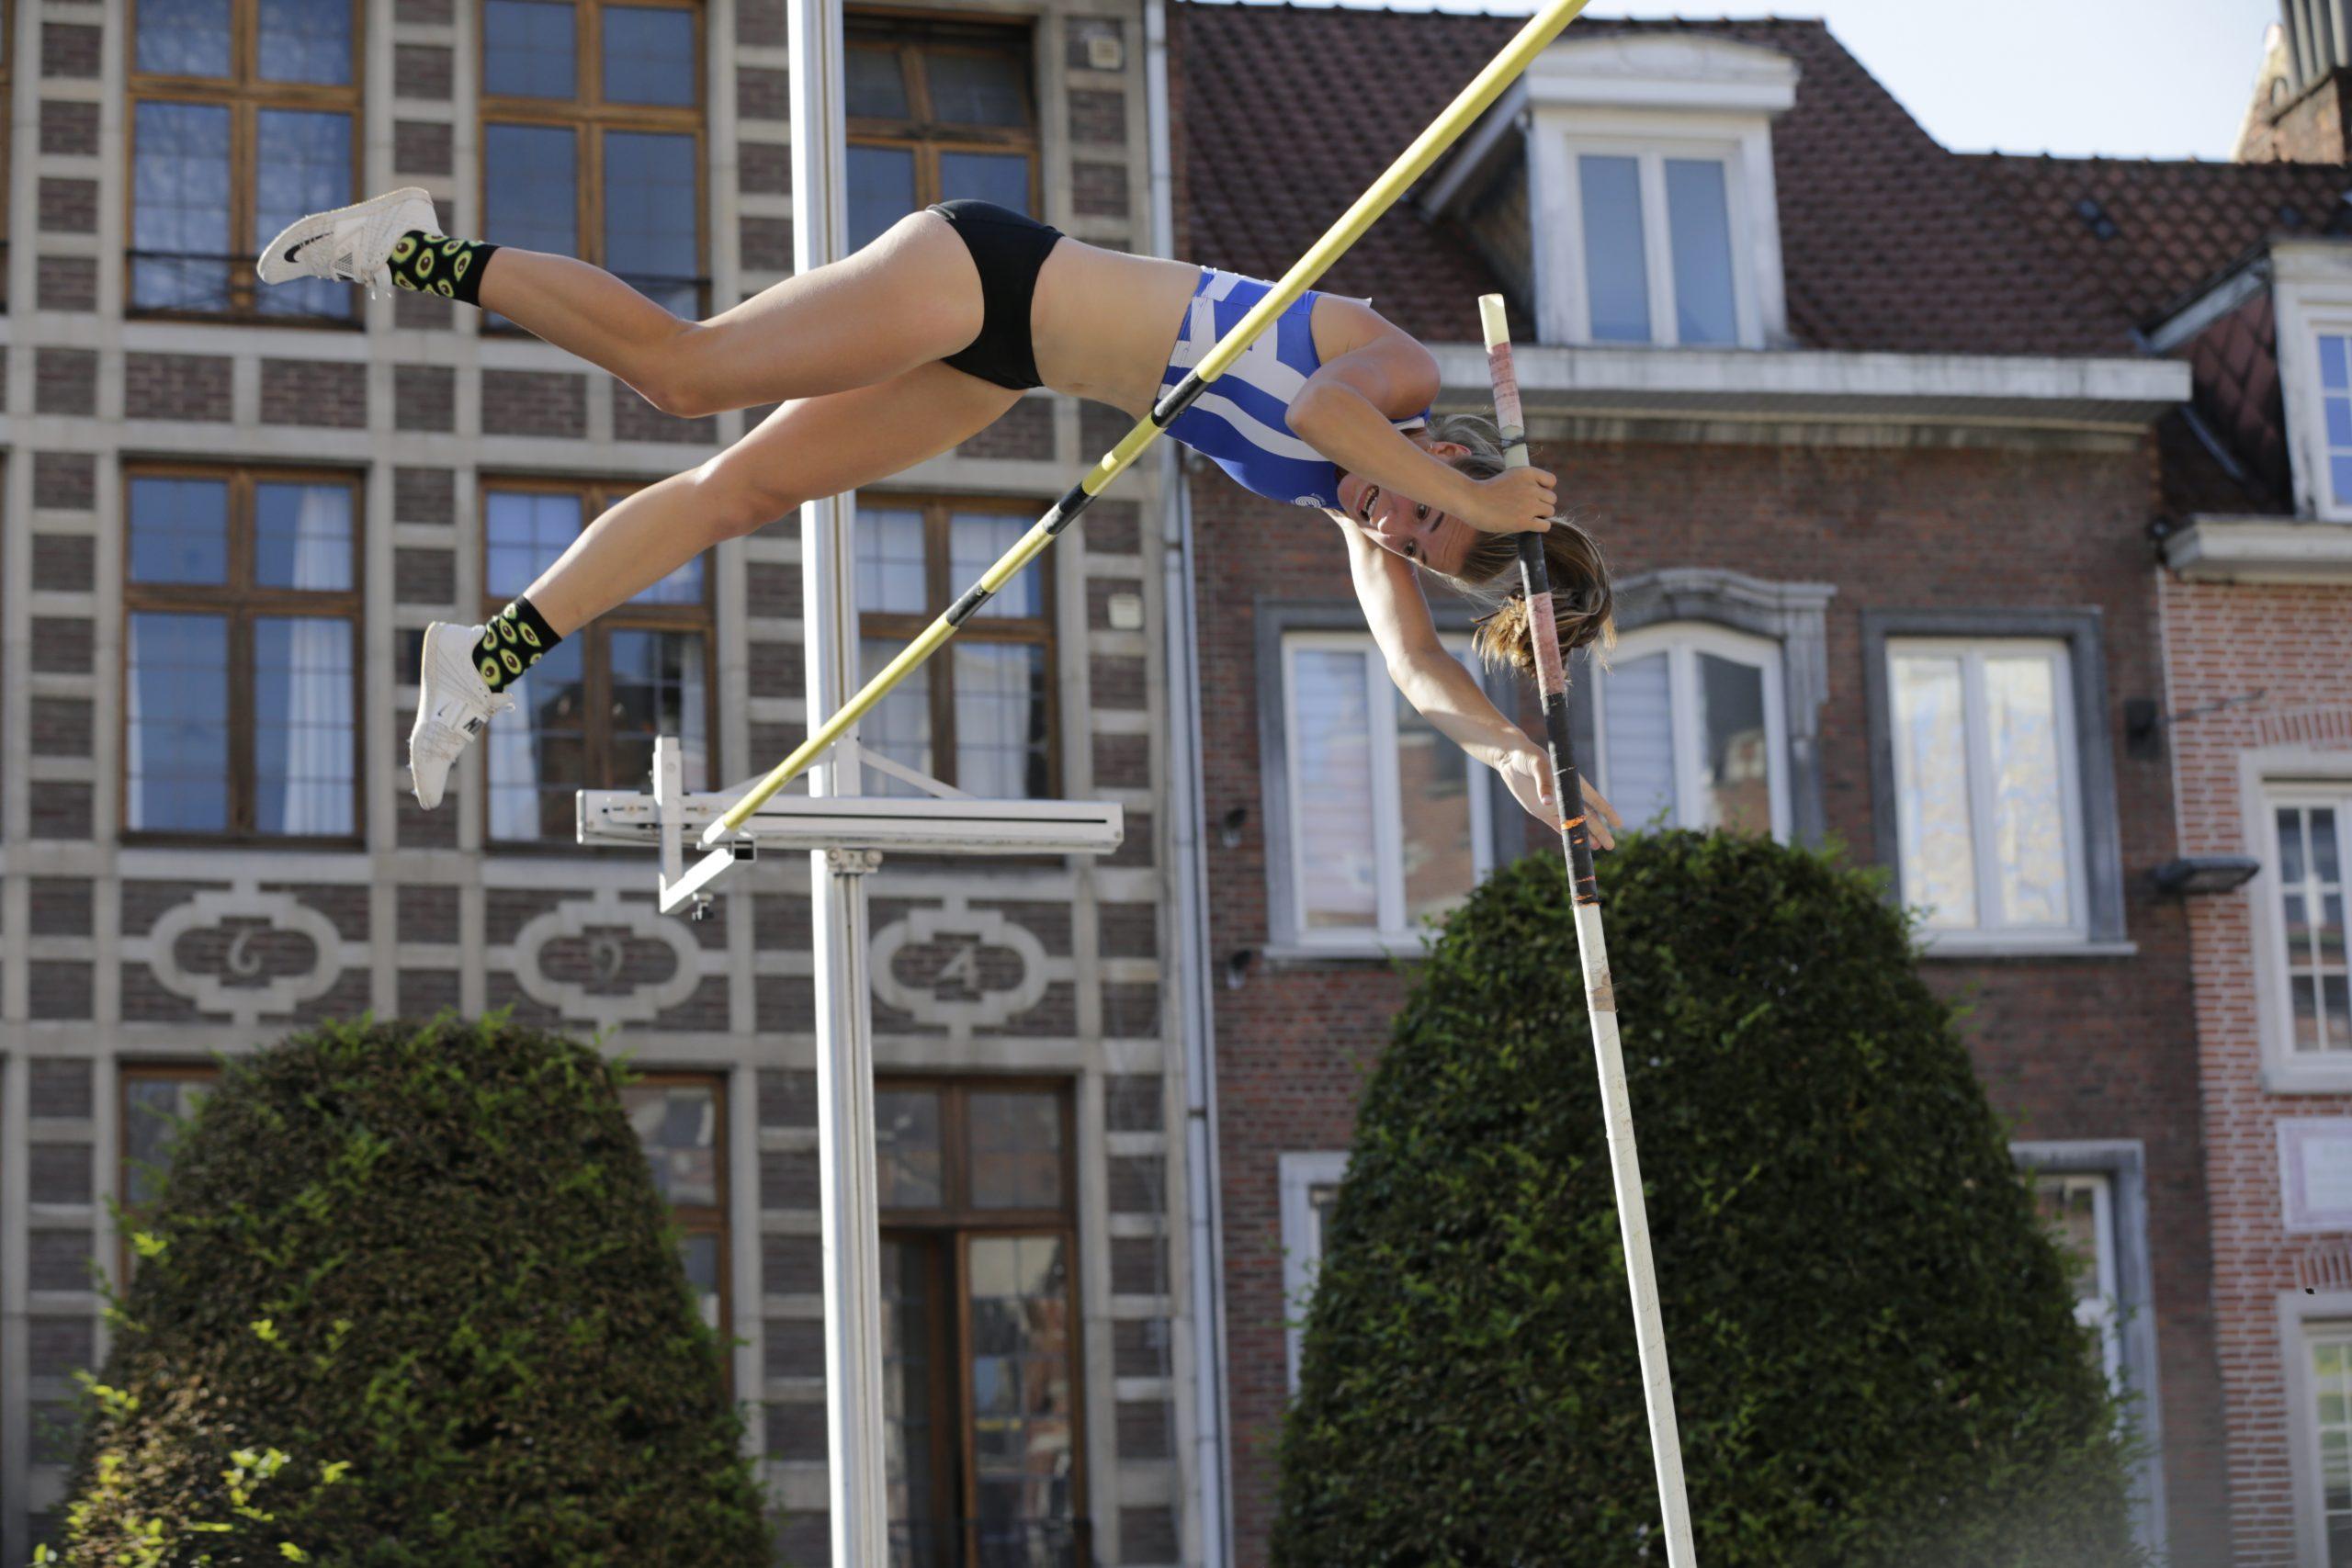 Zeven olympiërs in actie tijdens Leuvens polsstokgala